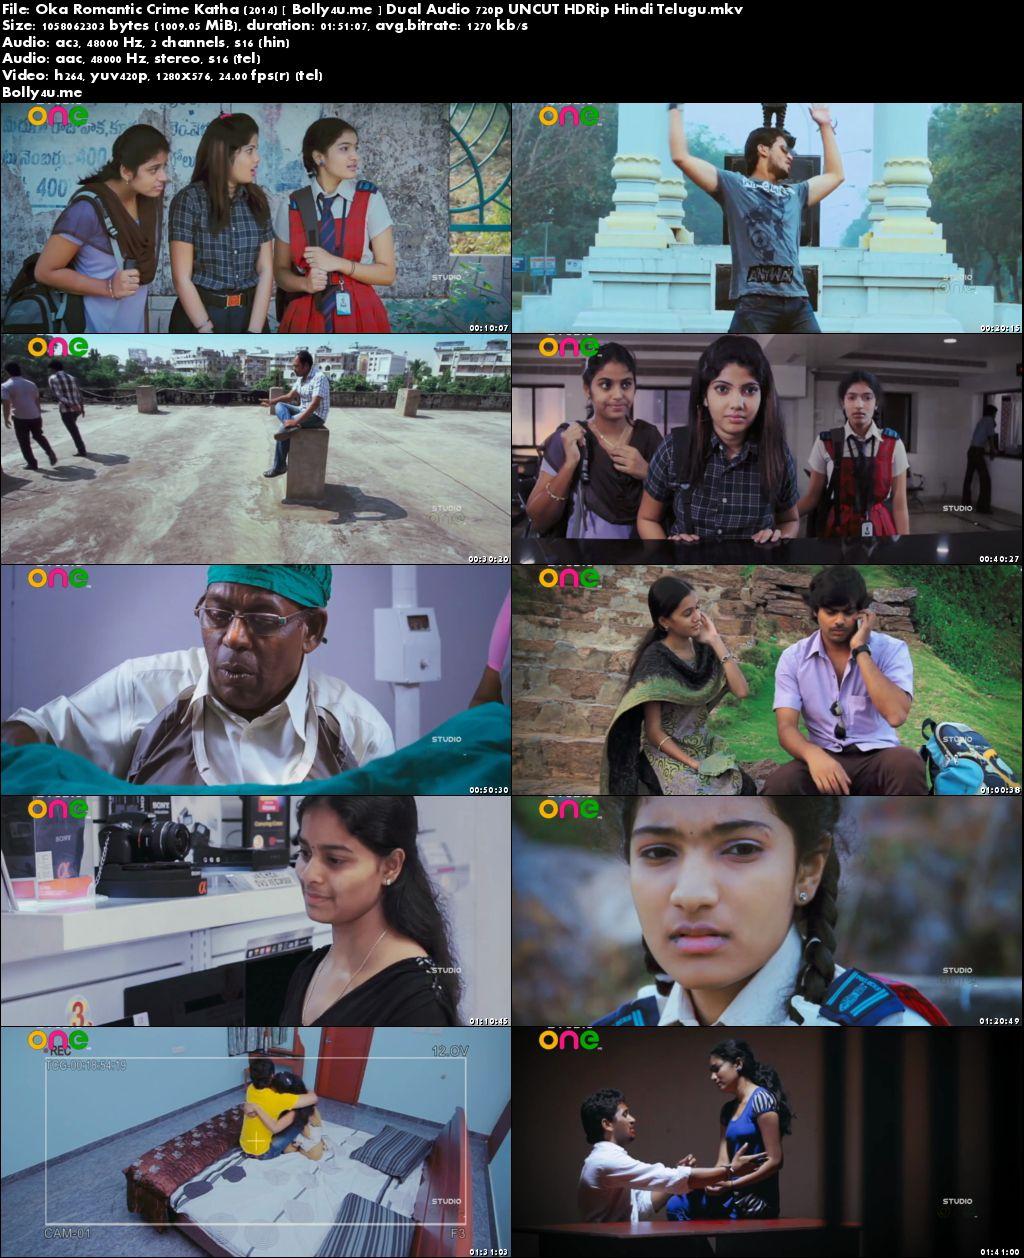 Oka Romantic Crime Katha 2014 HDRip 350MB UNCUT Hindi Dual Audio 480p Download